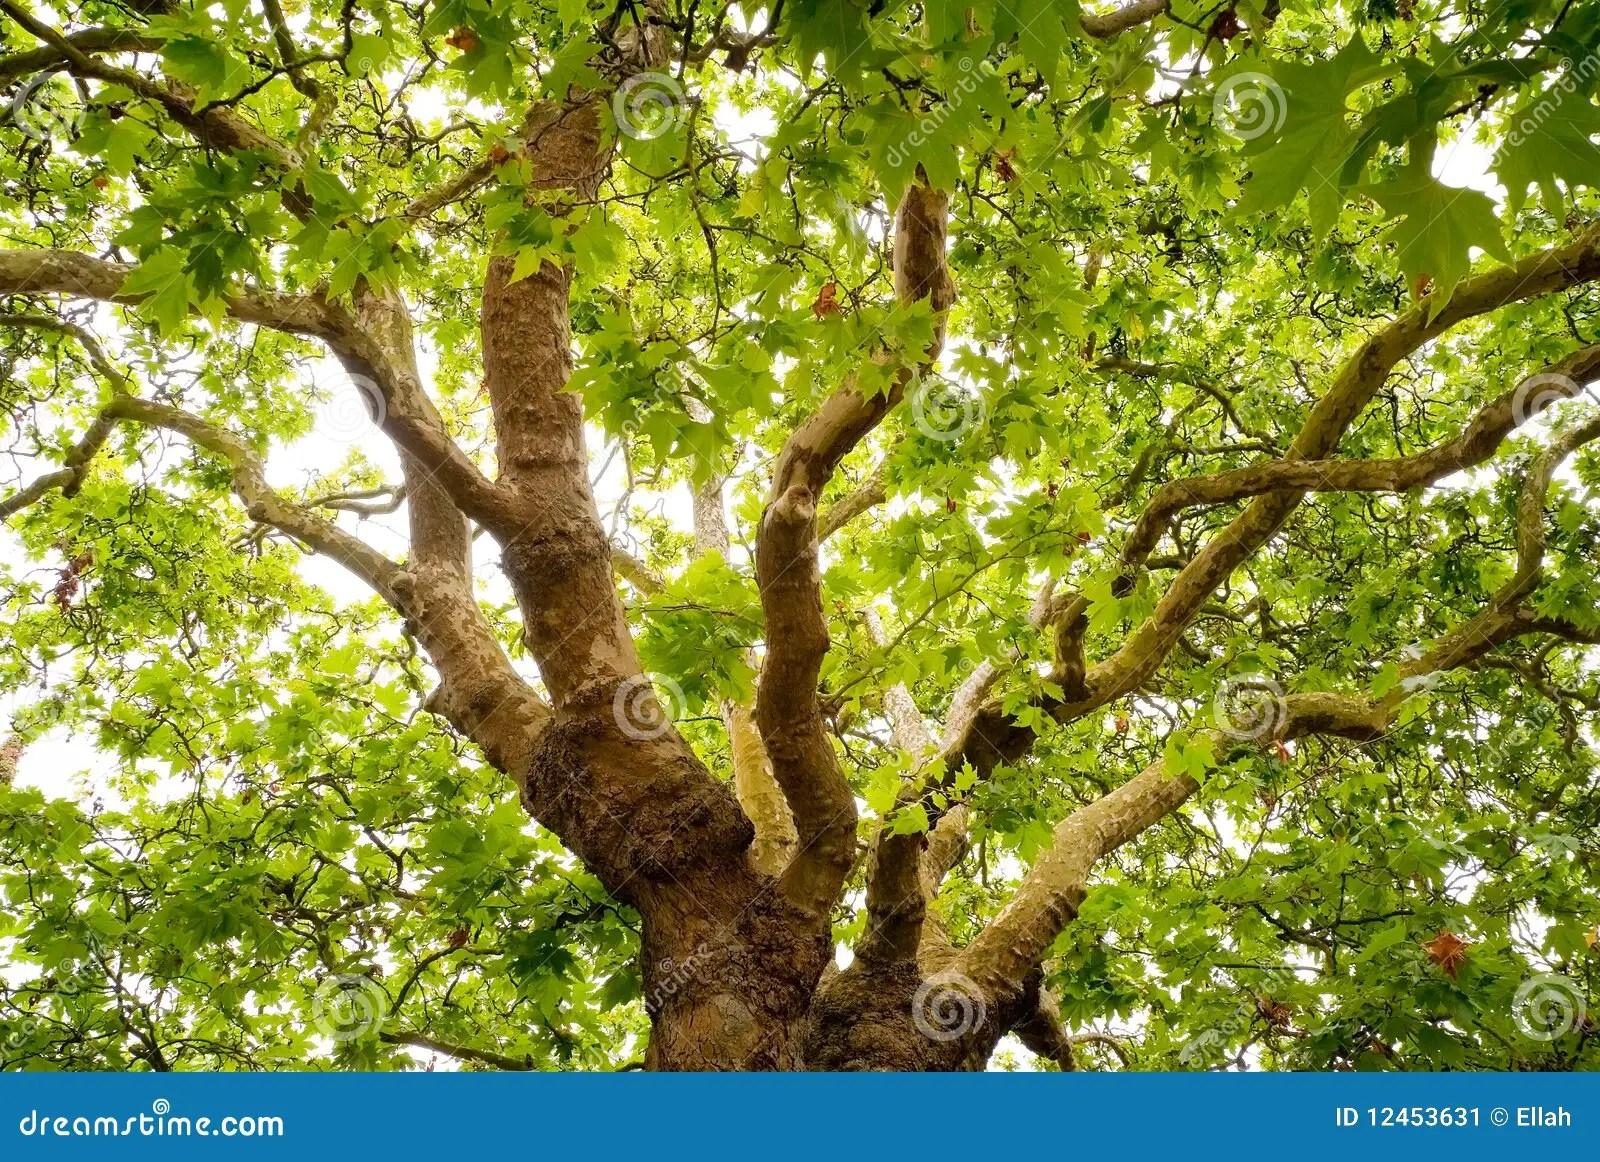 Free Fall Tree Wallpaper Old Oak Tree Stock Image Image 12453631